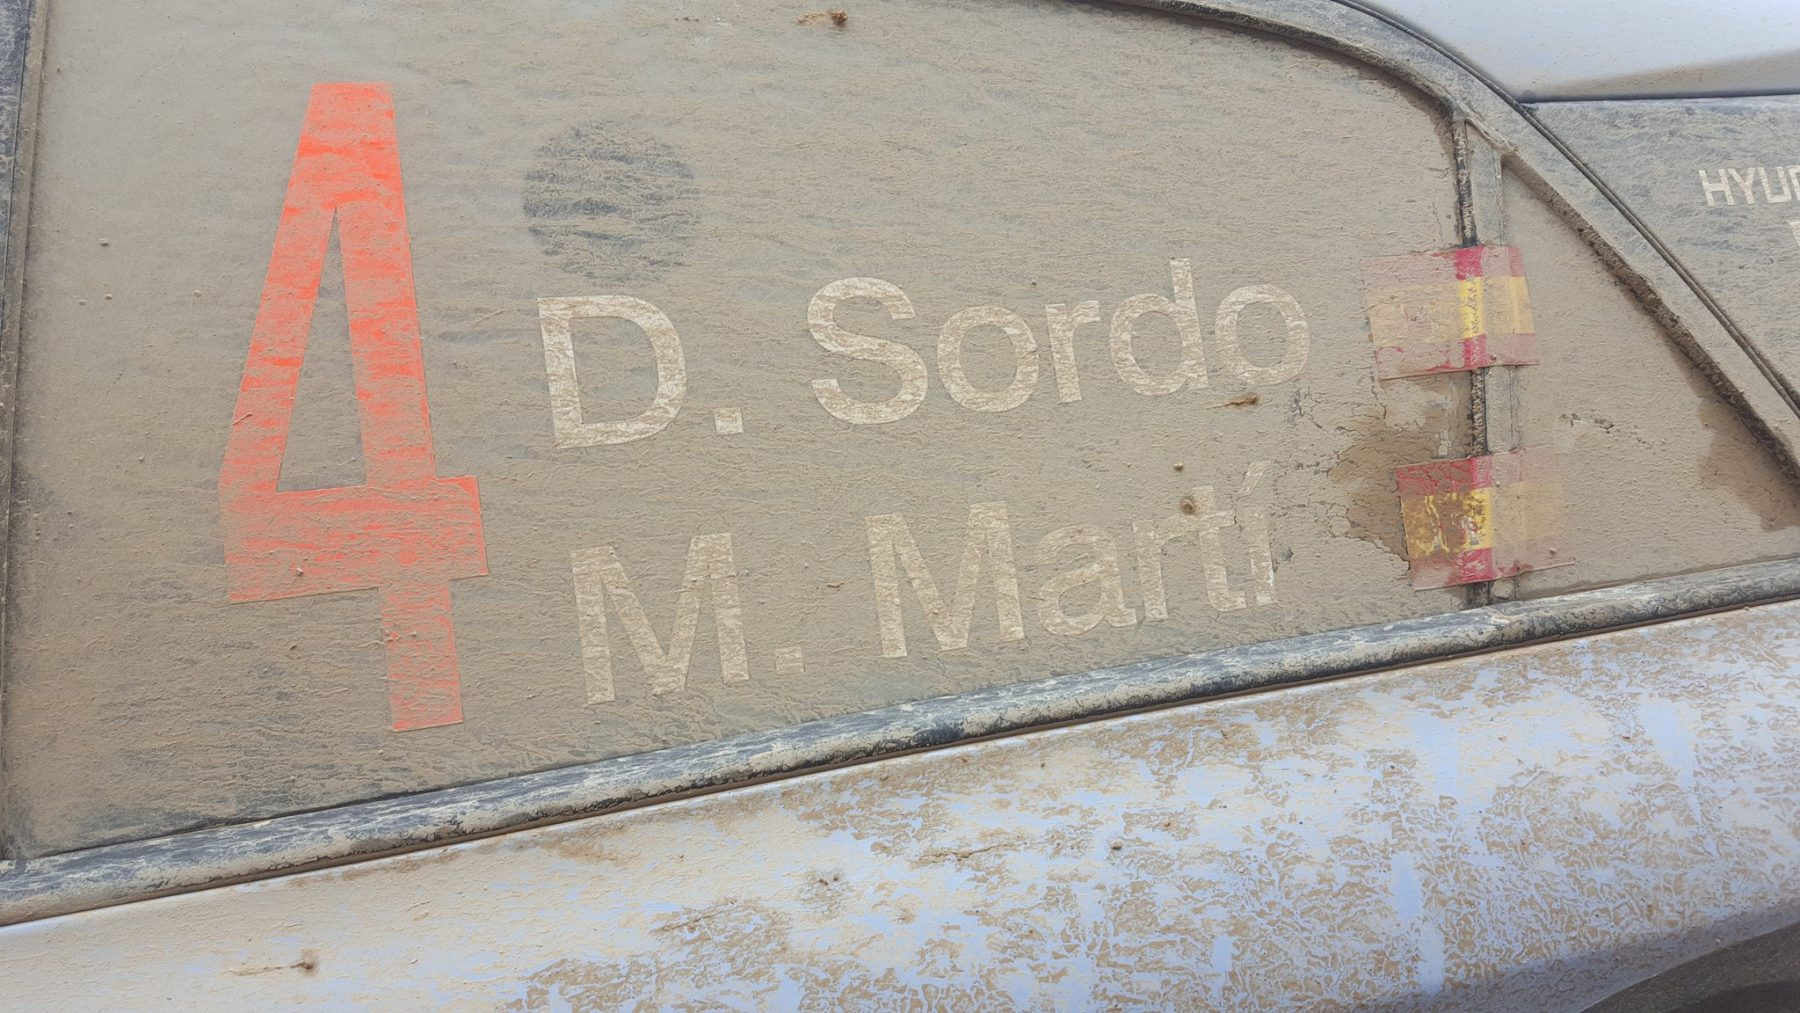 Dani Sordo